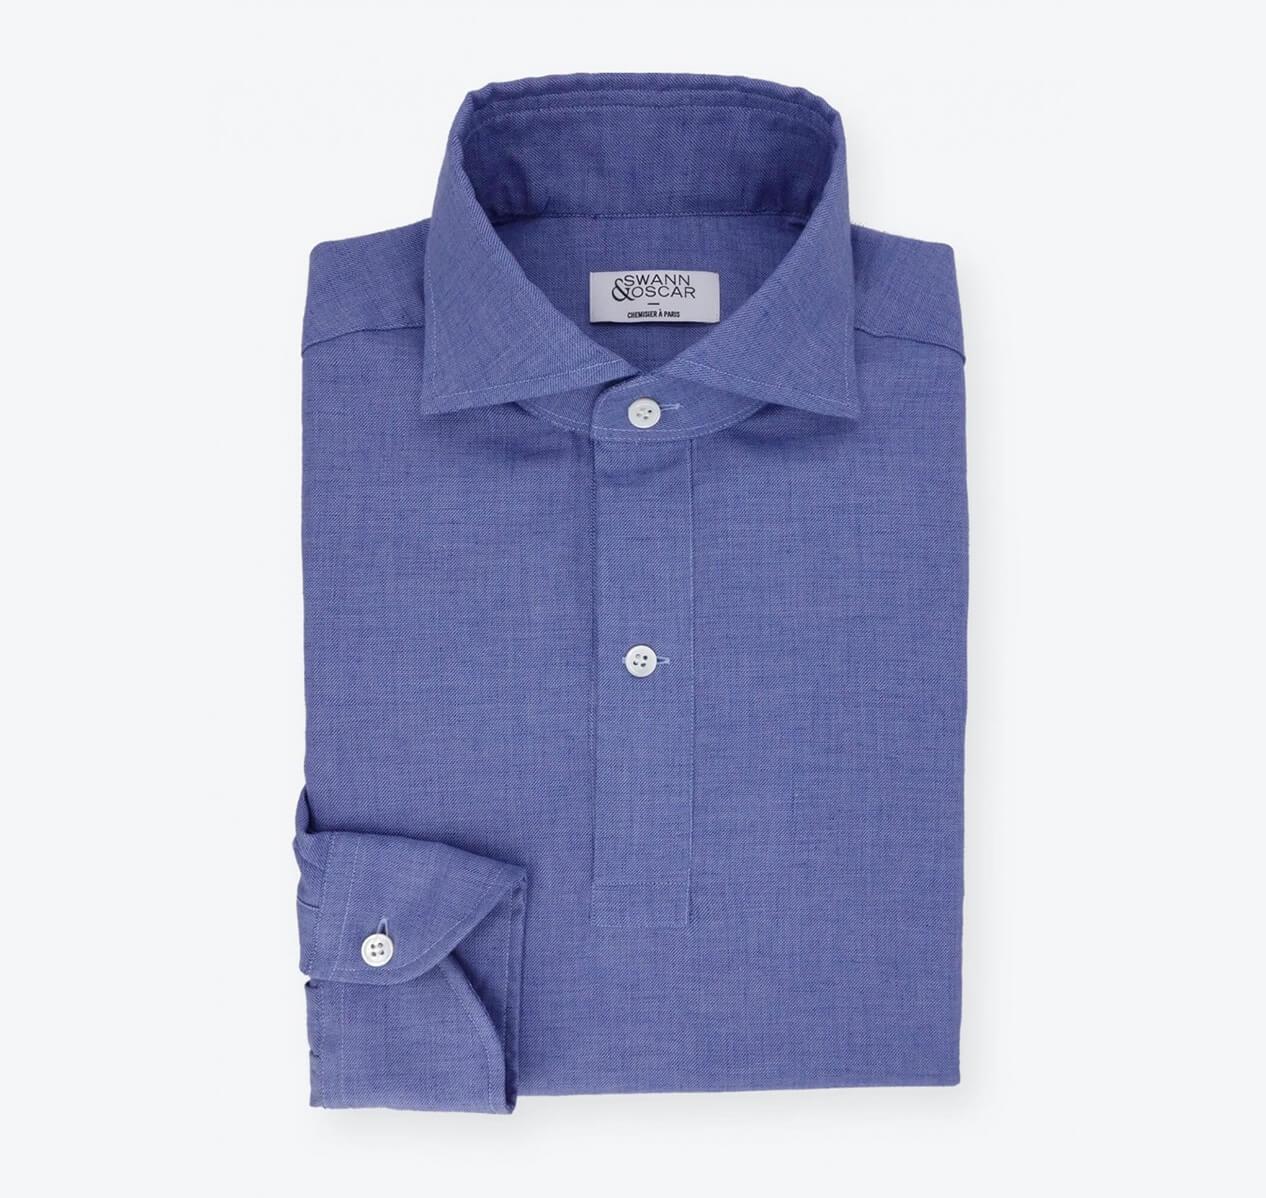 La Chemise Polo